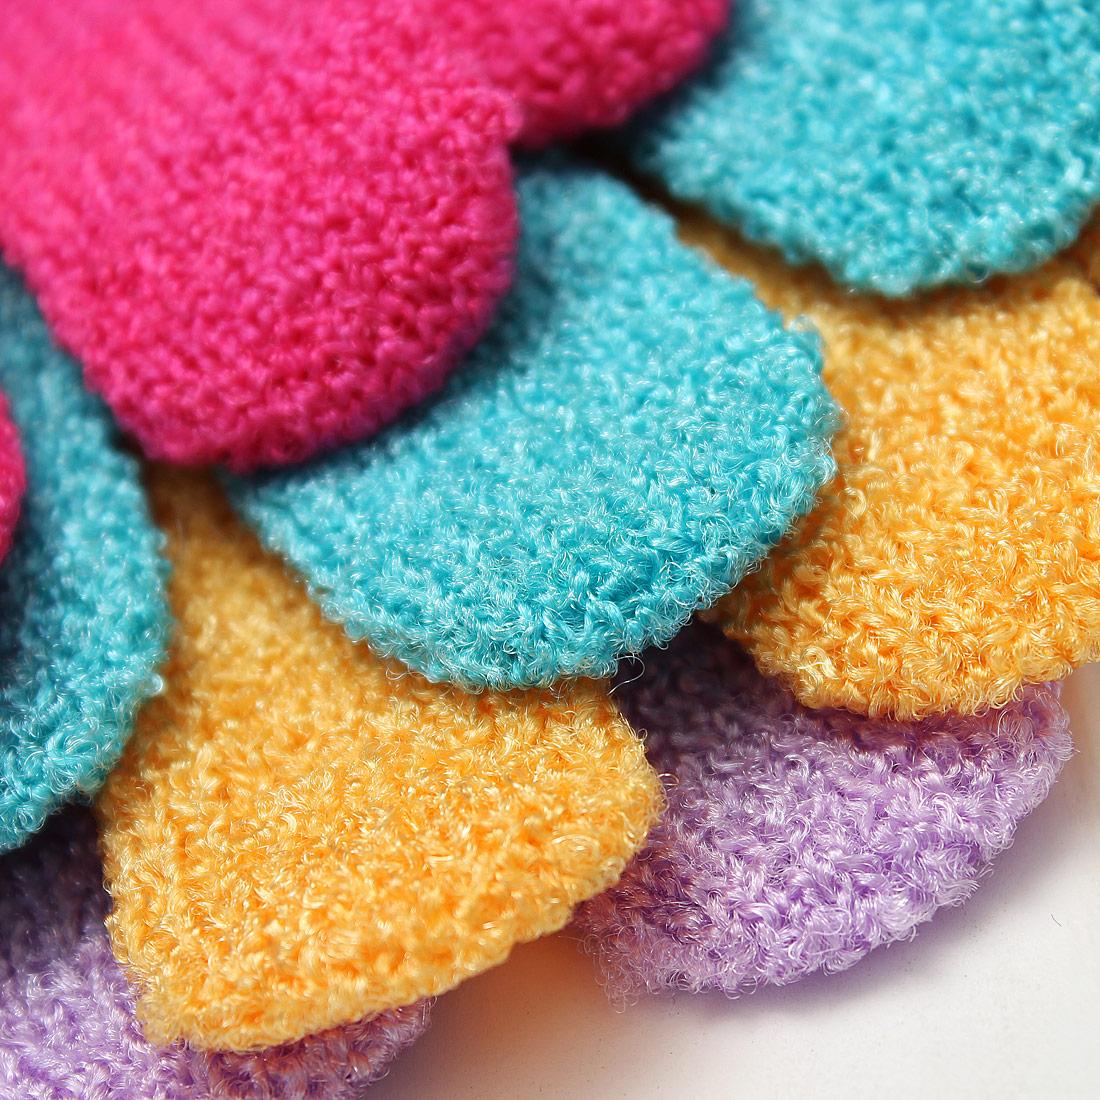 Gant de massage maison exfoliant gant de crin gant de toilette nylon douche bain ebay - Gant de toilette exfoliant ...